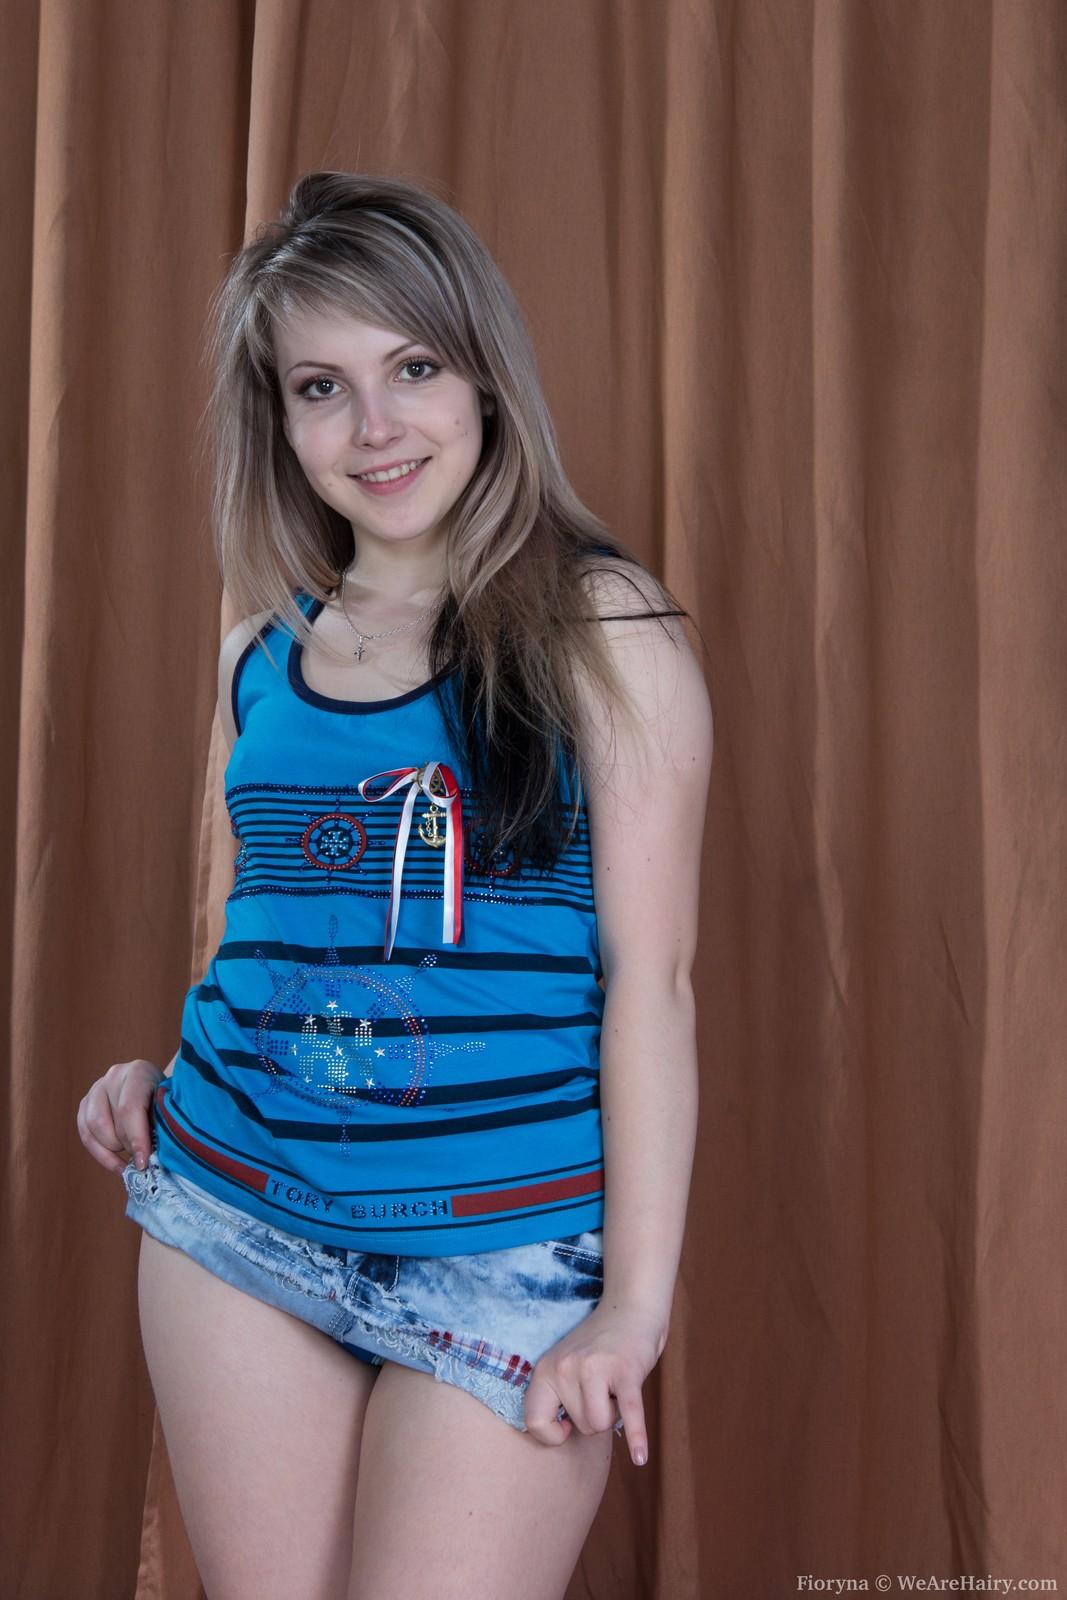 Fioryna